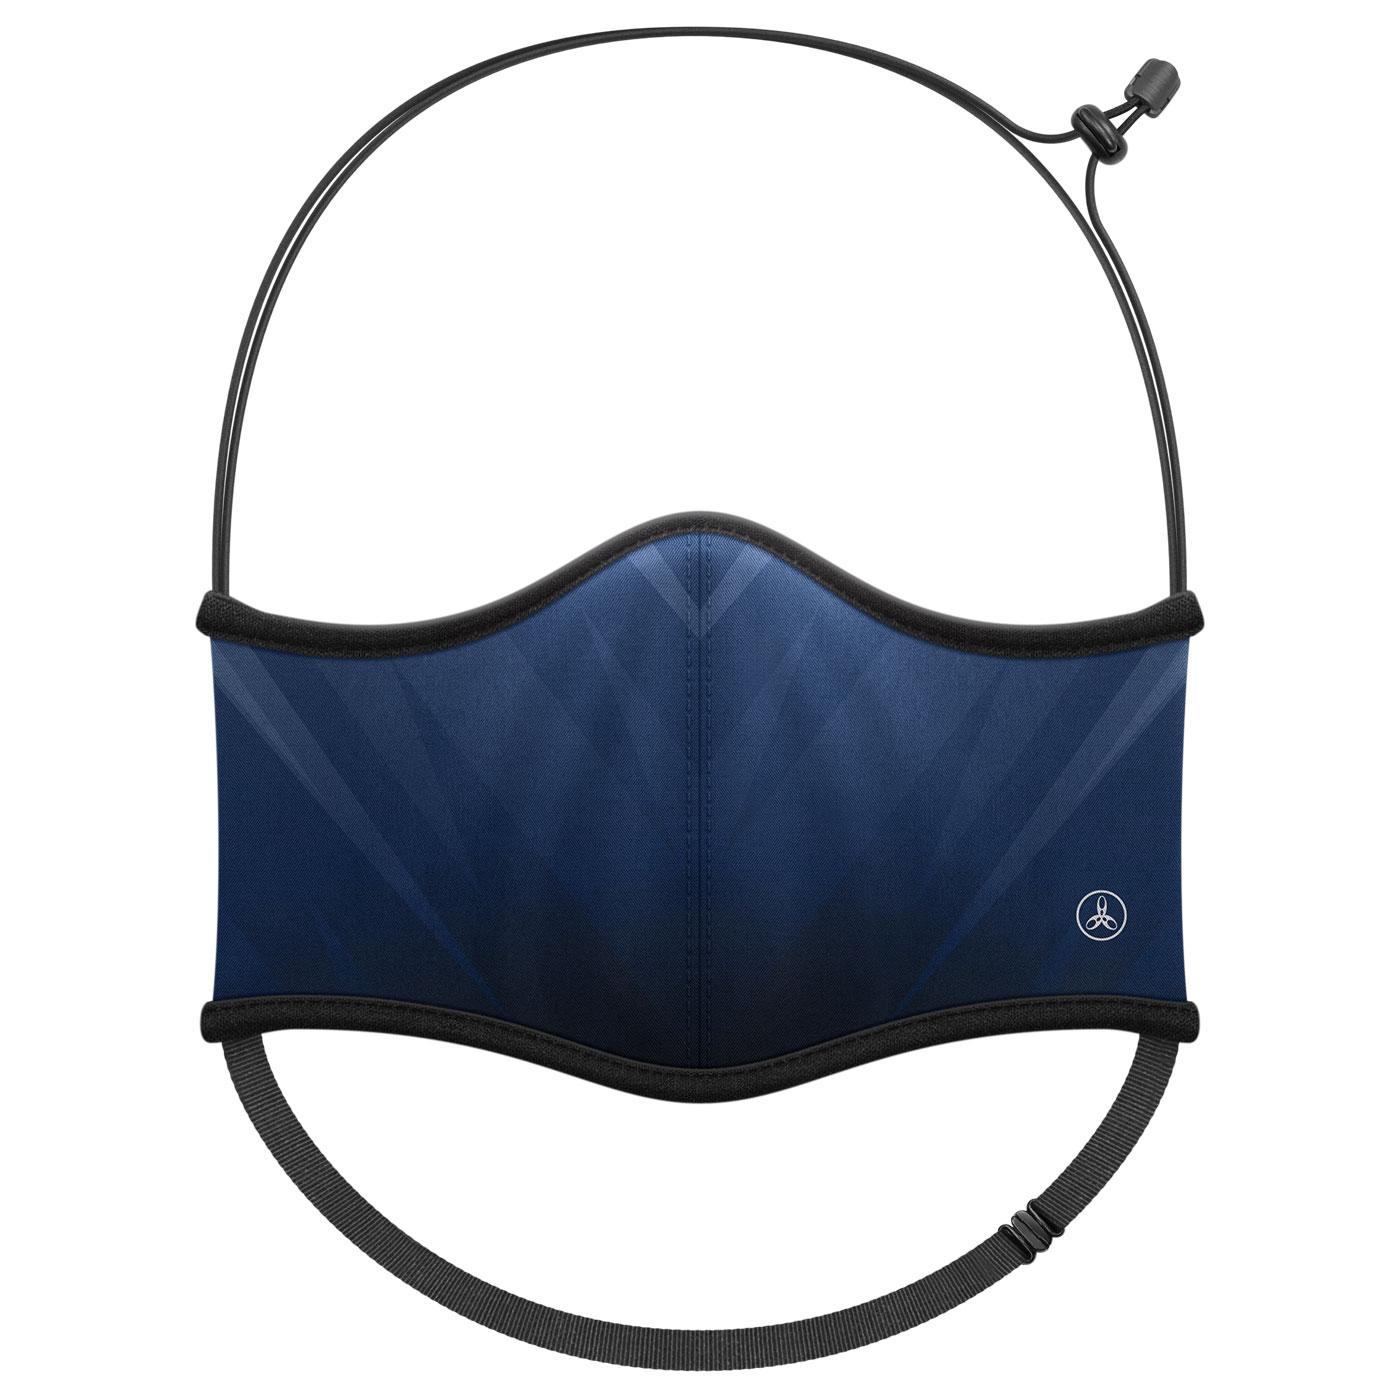 HODARLA 運動舒適口罩6032201 - 深藍